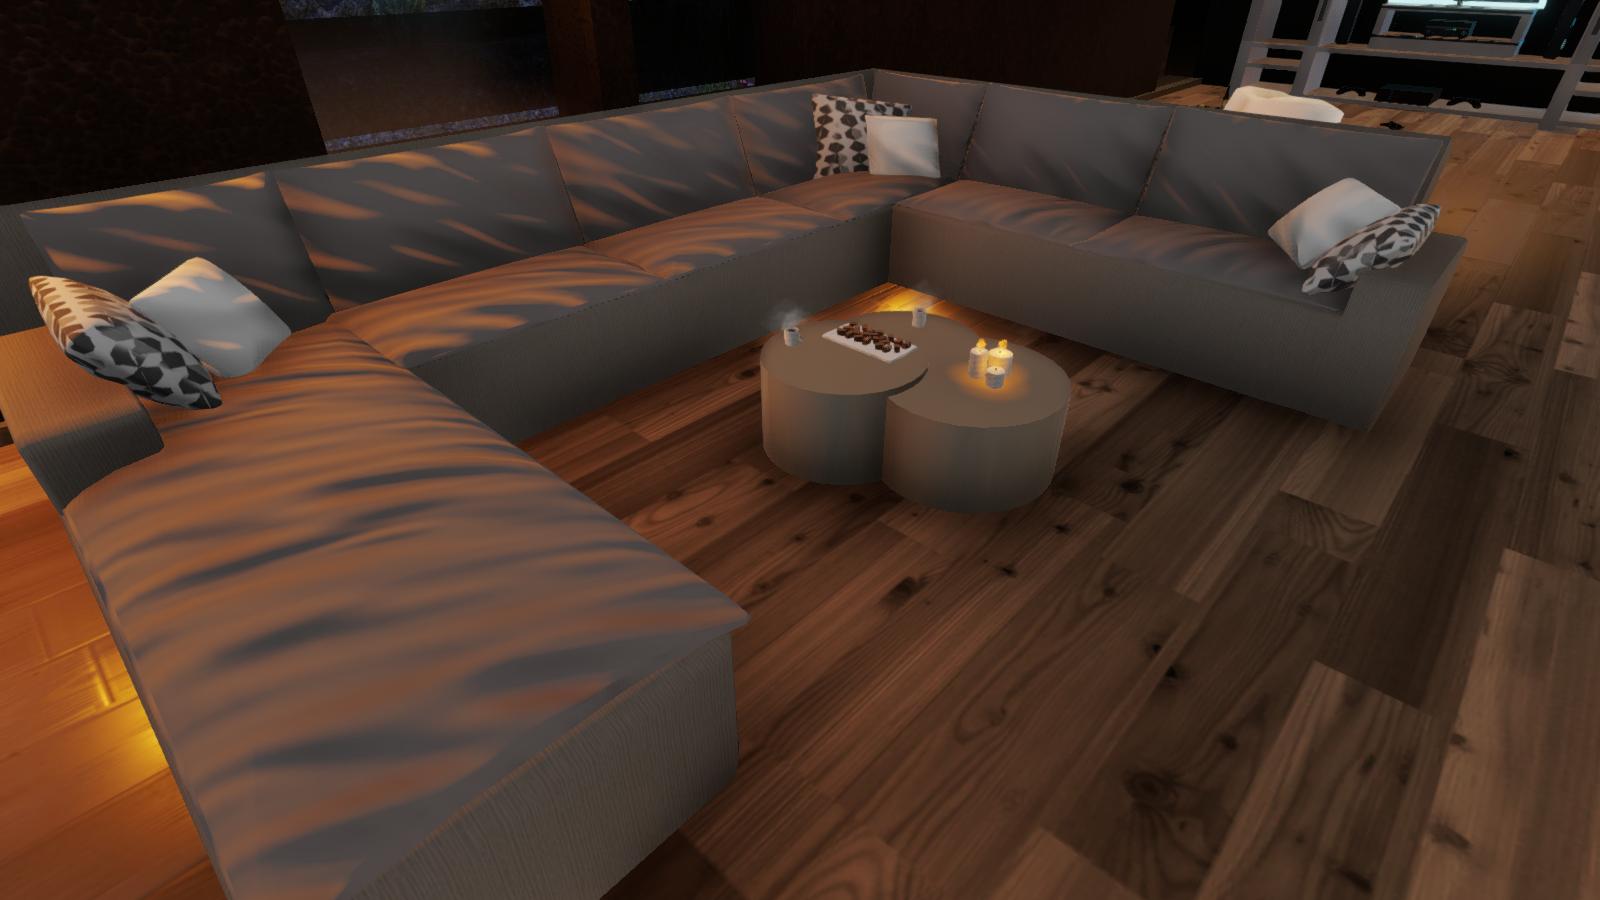 Object 02 - Sofa